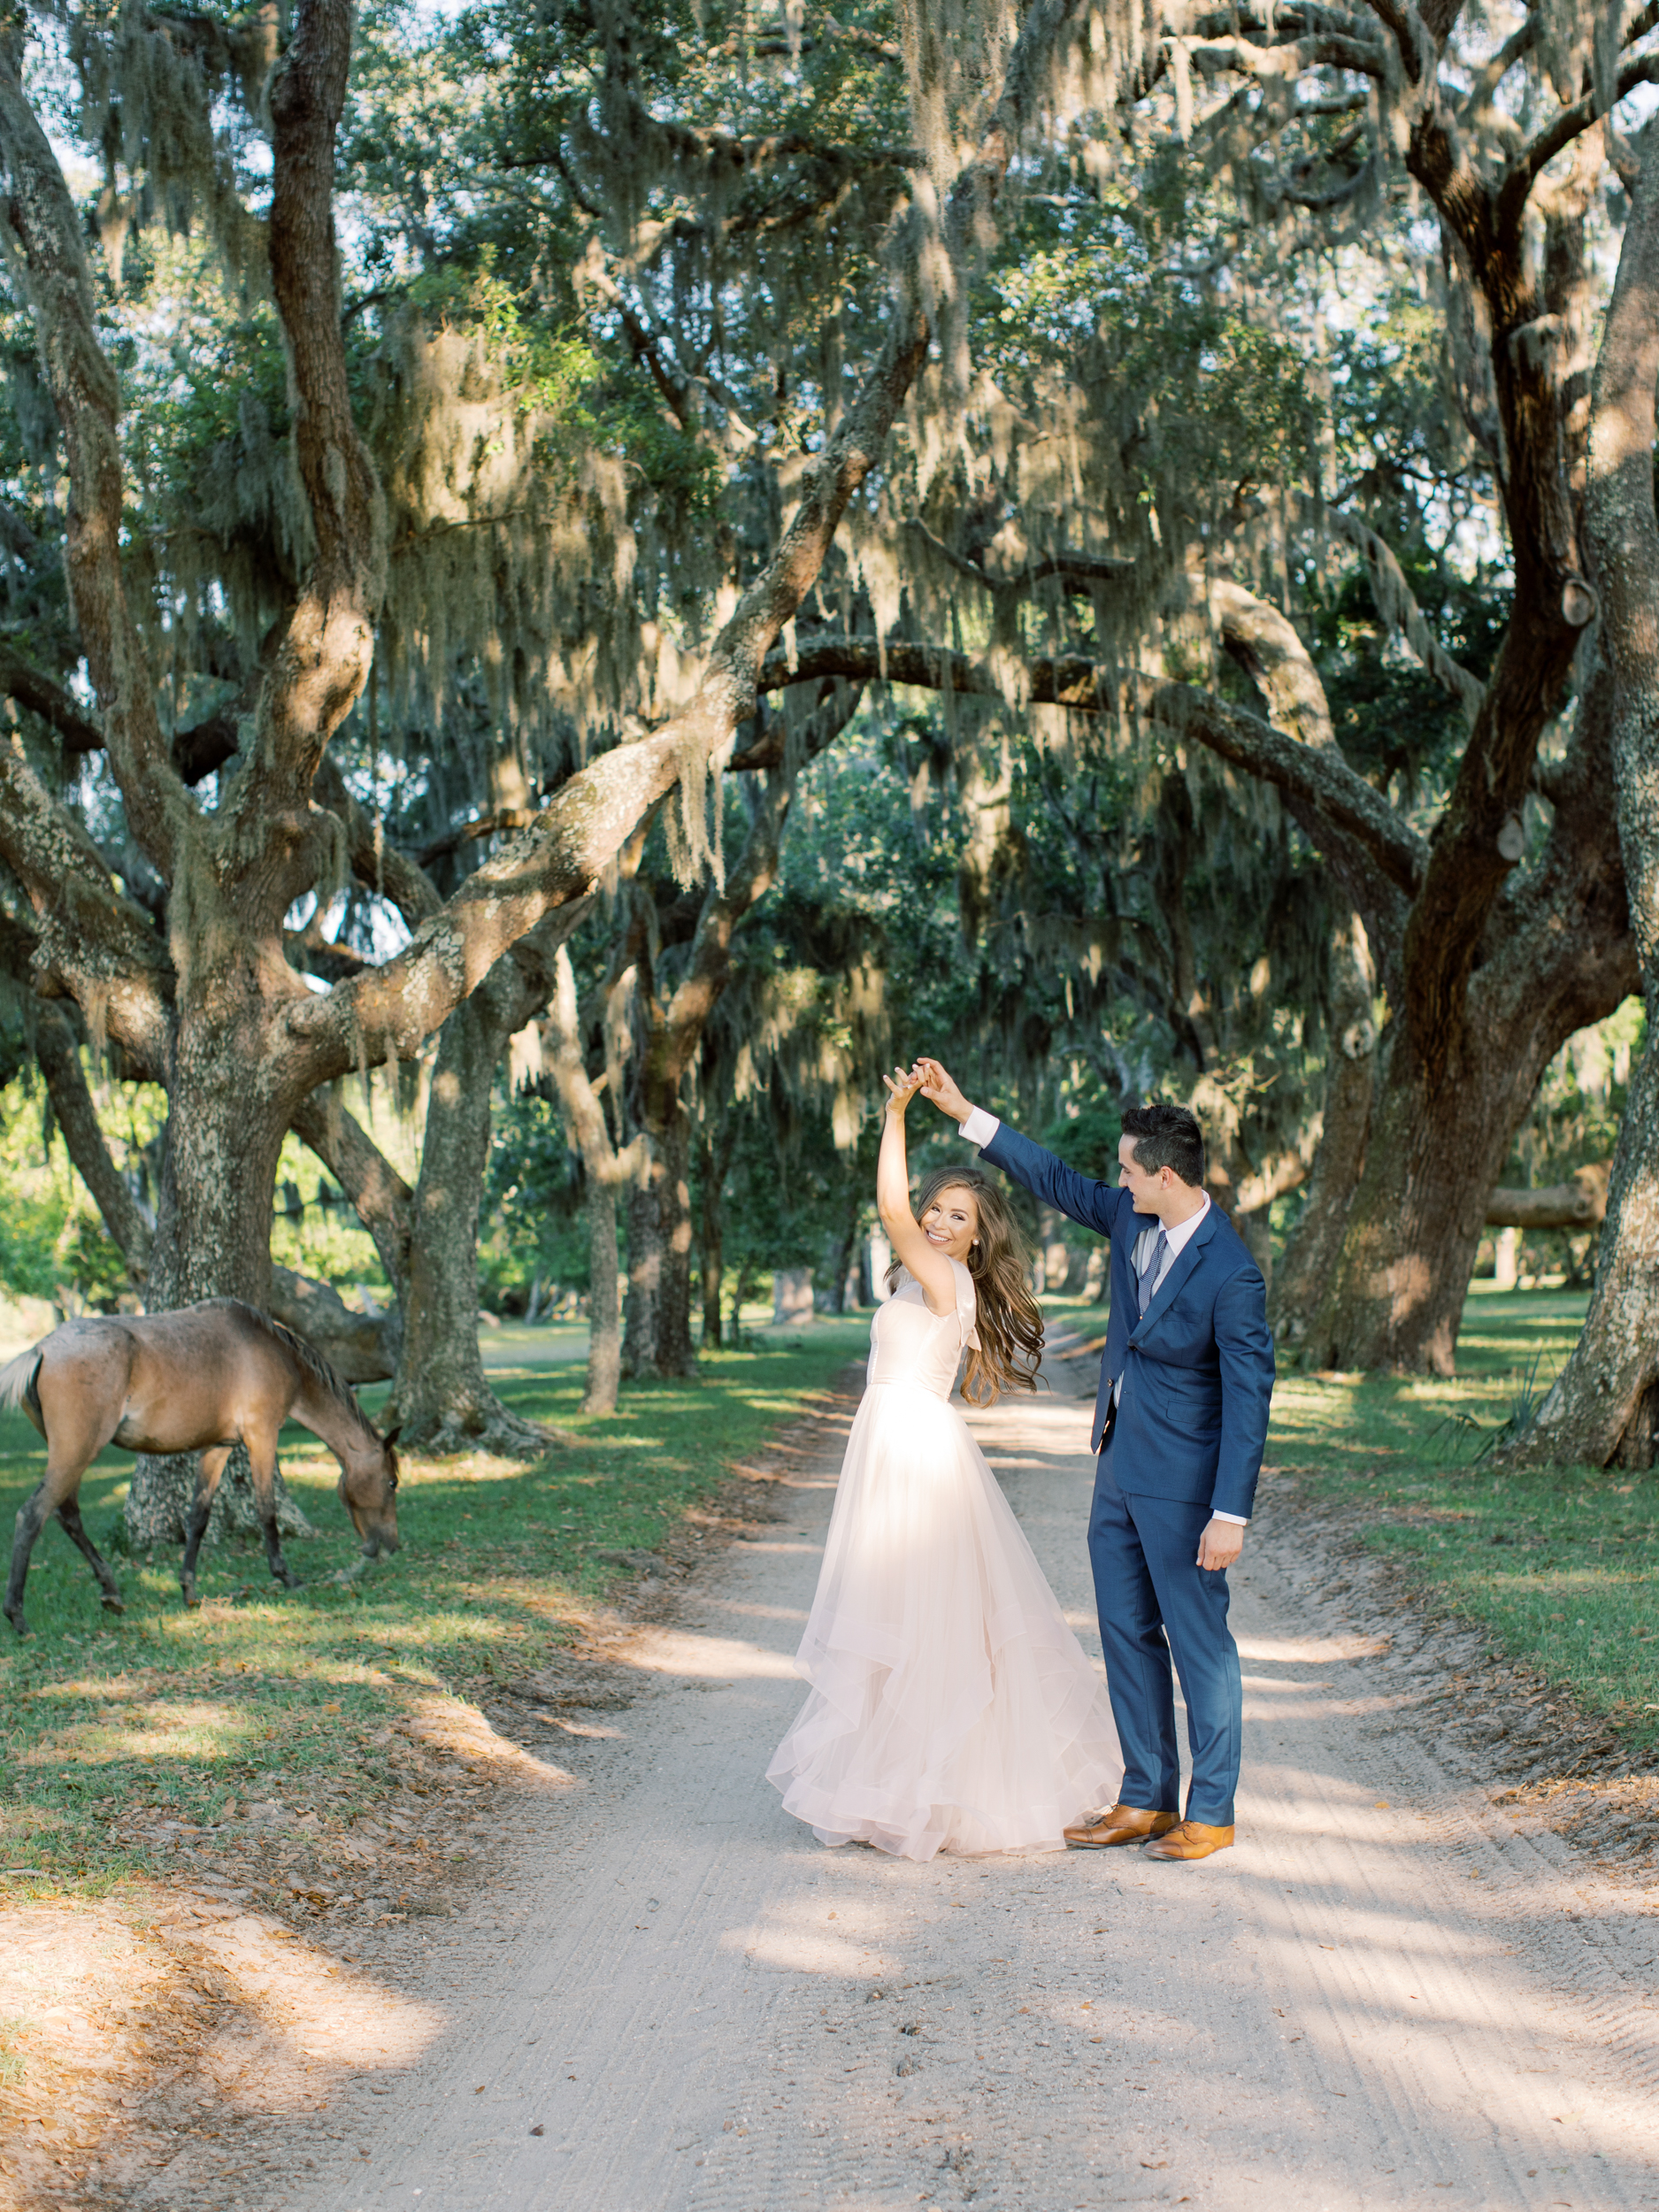 Lisa Silva Photography Jacksonville, St Augustine, Ponte Vedra Beach, Fernandina Beach, Amelia Island, Florida Fine Art Film Wedding Photographer3.jpg